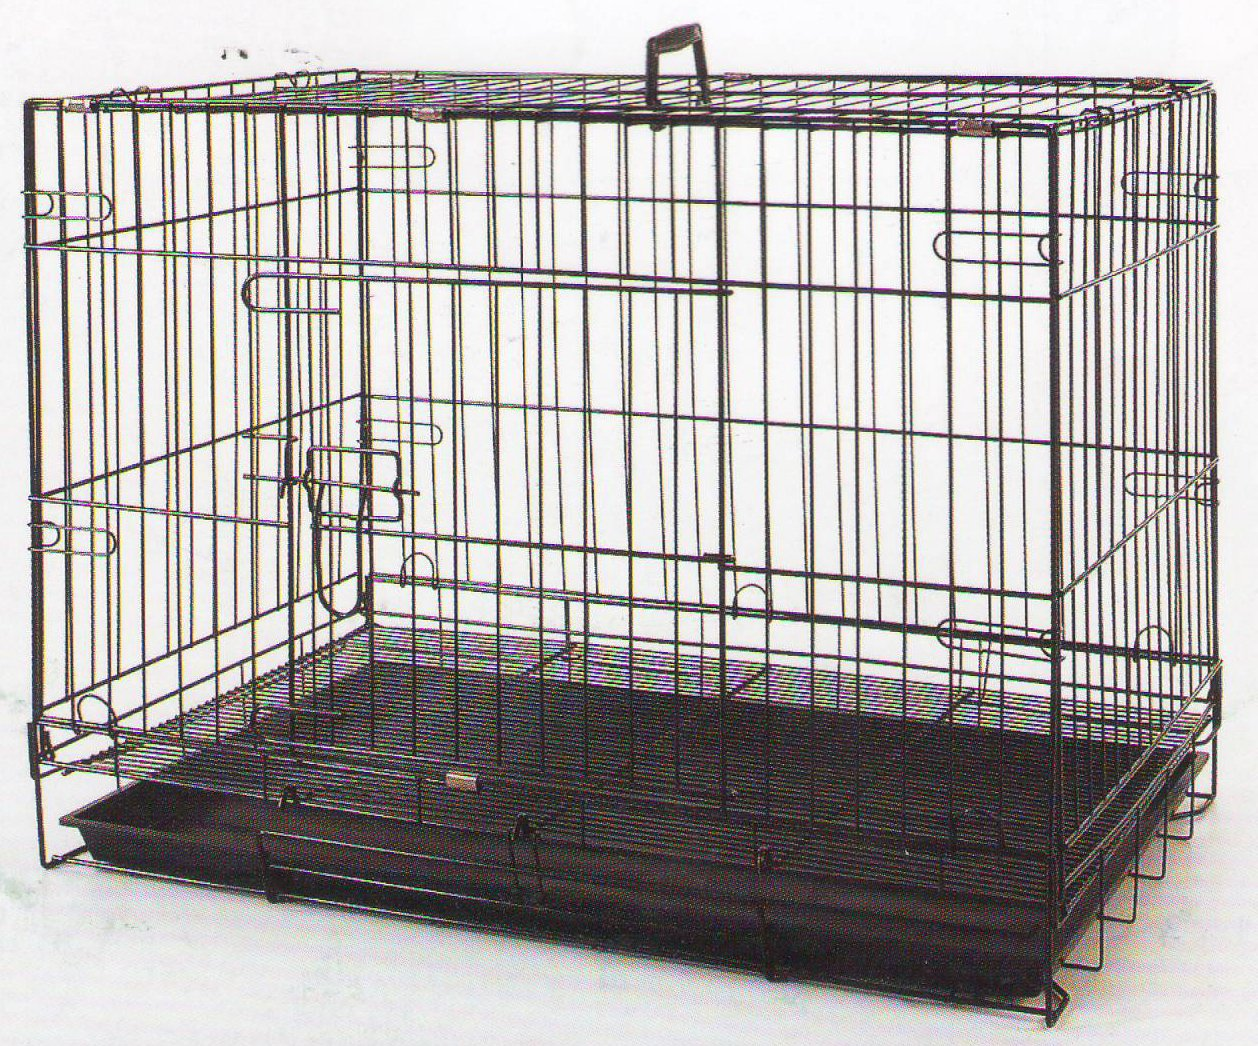 24 Inch Foldable Breeder Puppy Kitten Rabbit Training Cage With 1/2 inch Bottom Wire Grid Mesh Floor